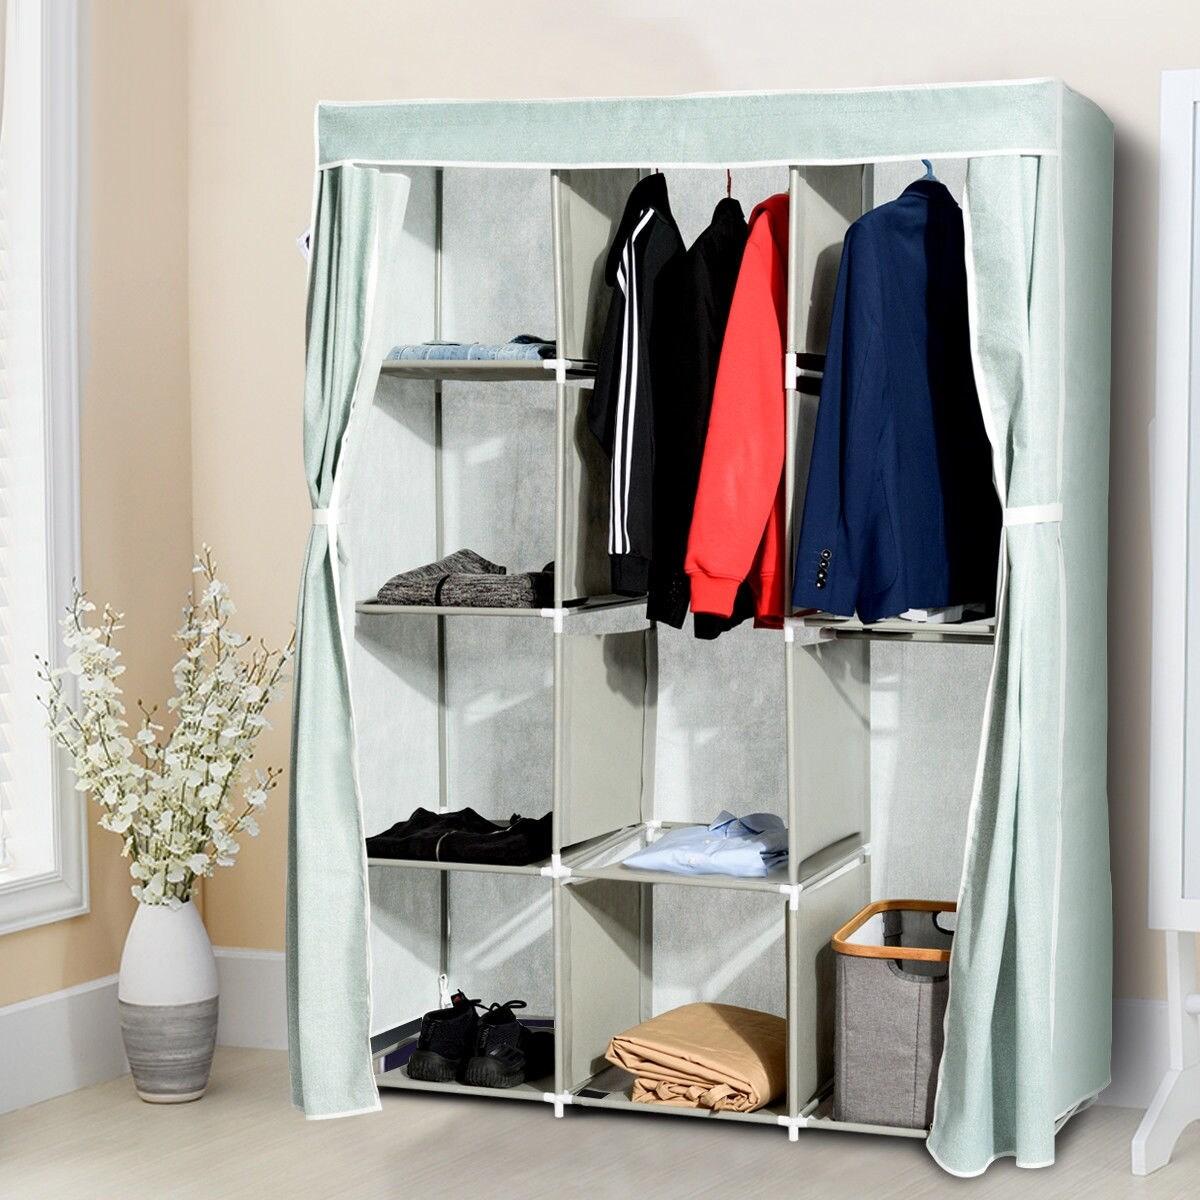 Gymax Portable Clothes Closet Storage Organizer Fabric Wardrobe Cabinet Rack As Pic